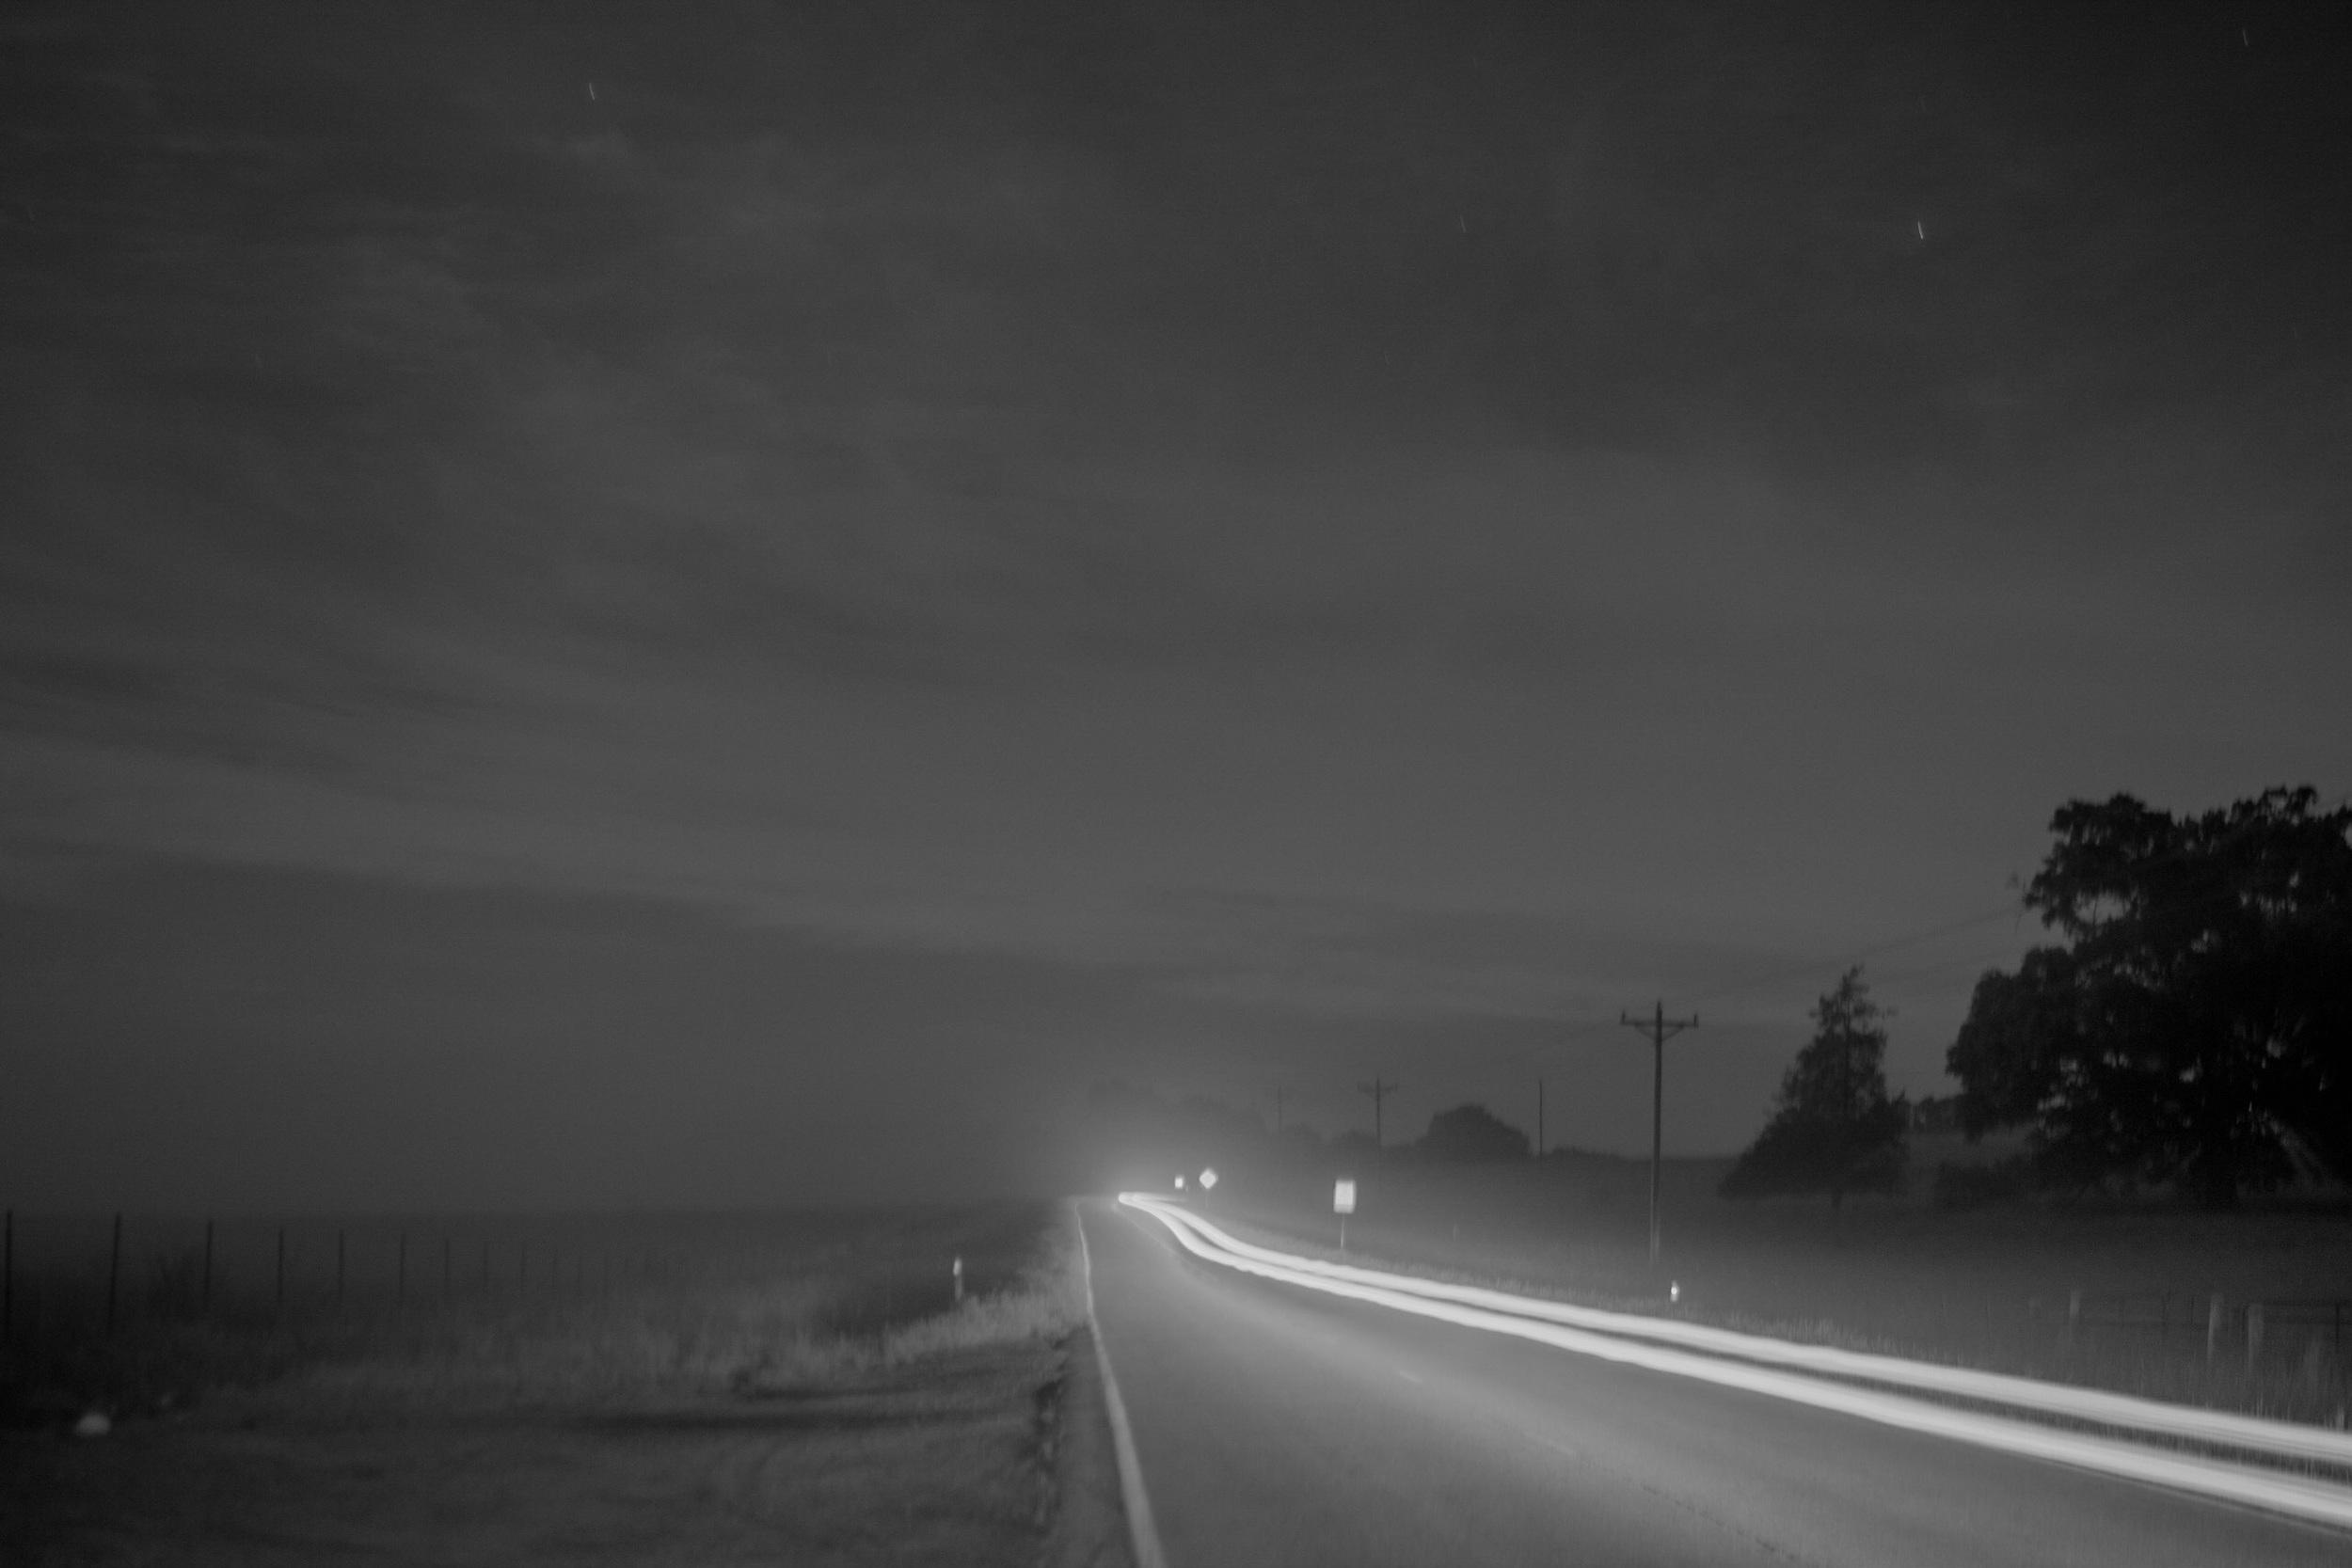 "35mm, f/1.8, 25"" exposure @ some field up past watkinsville"